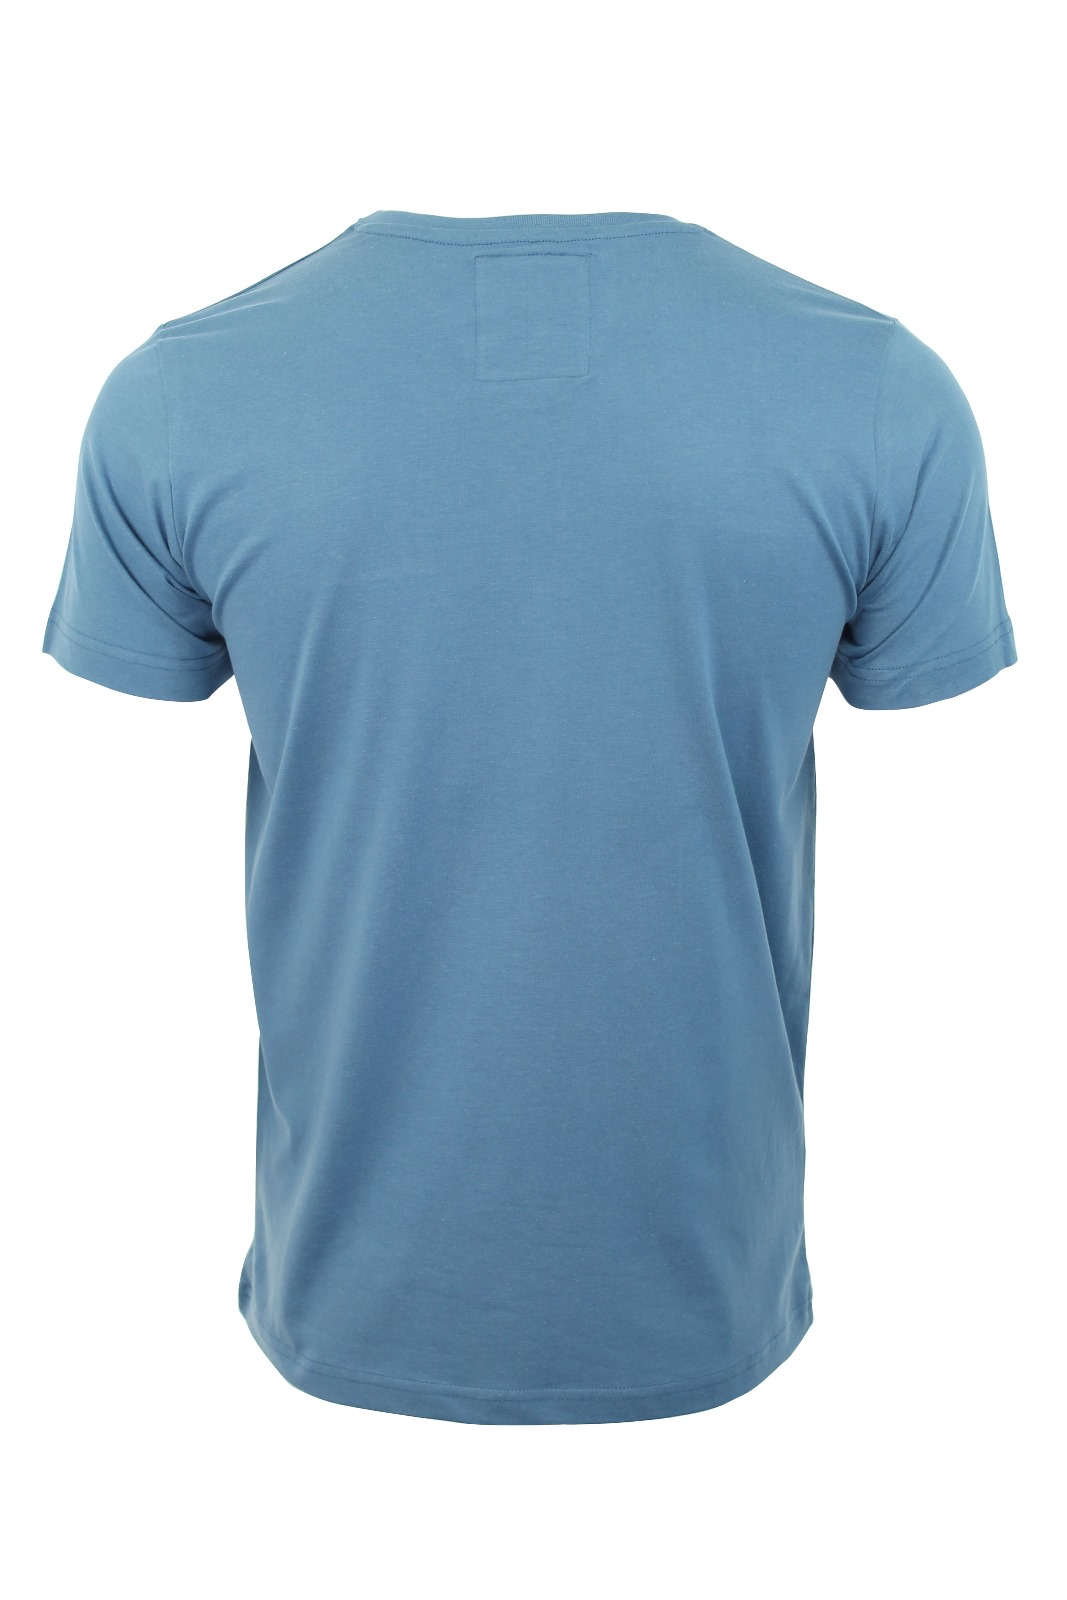 Dissident mens t shirt 39 kramer 39 v neck short sleeved with for Men s v neck pocket tee shirts